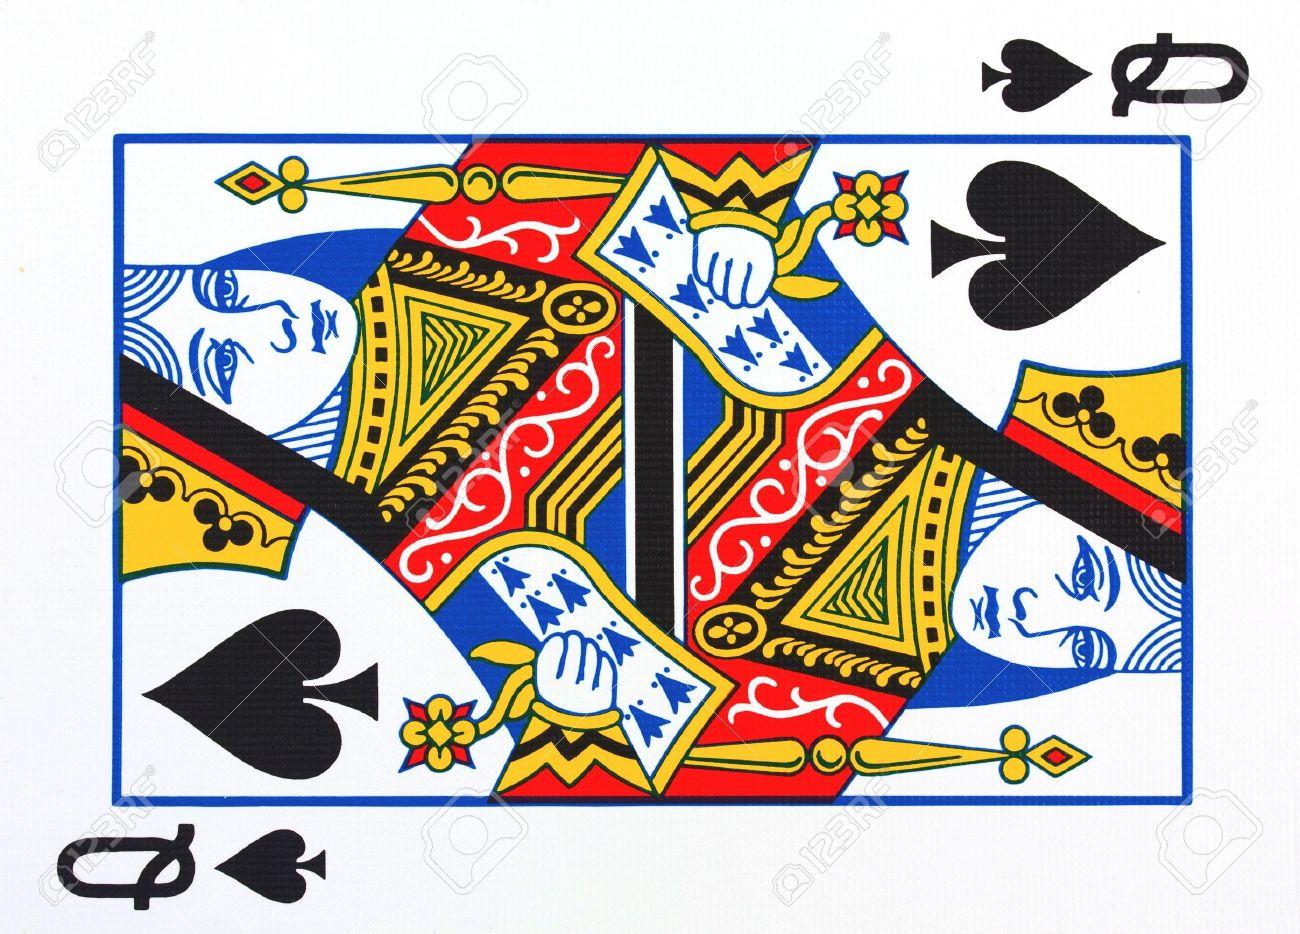 Queen of spades pictures